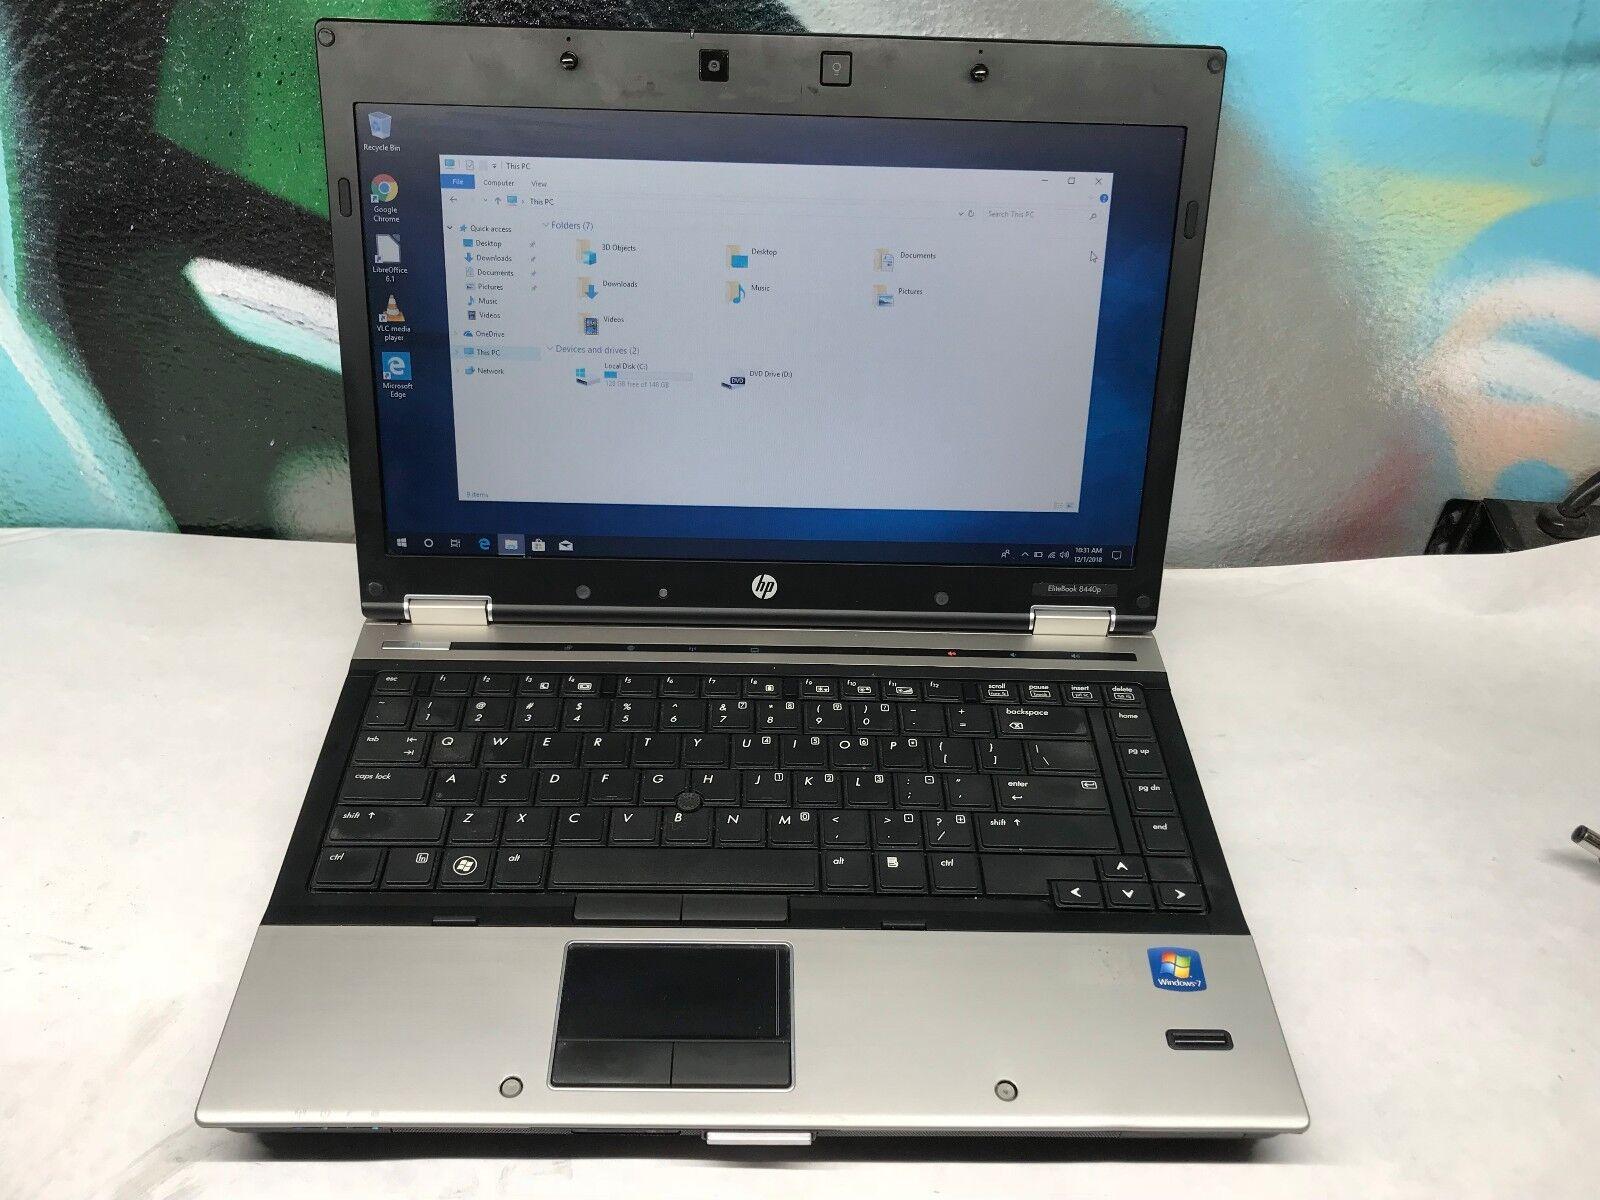 Laptop Windows - HP EliteBook 8440p Laptop / i5 2.4GHZ /  4GB DDR3 / 160GB Windows 10 COMPLETE